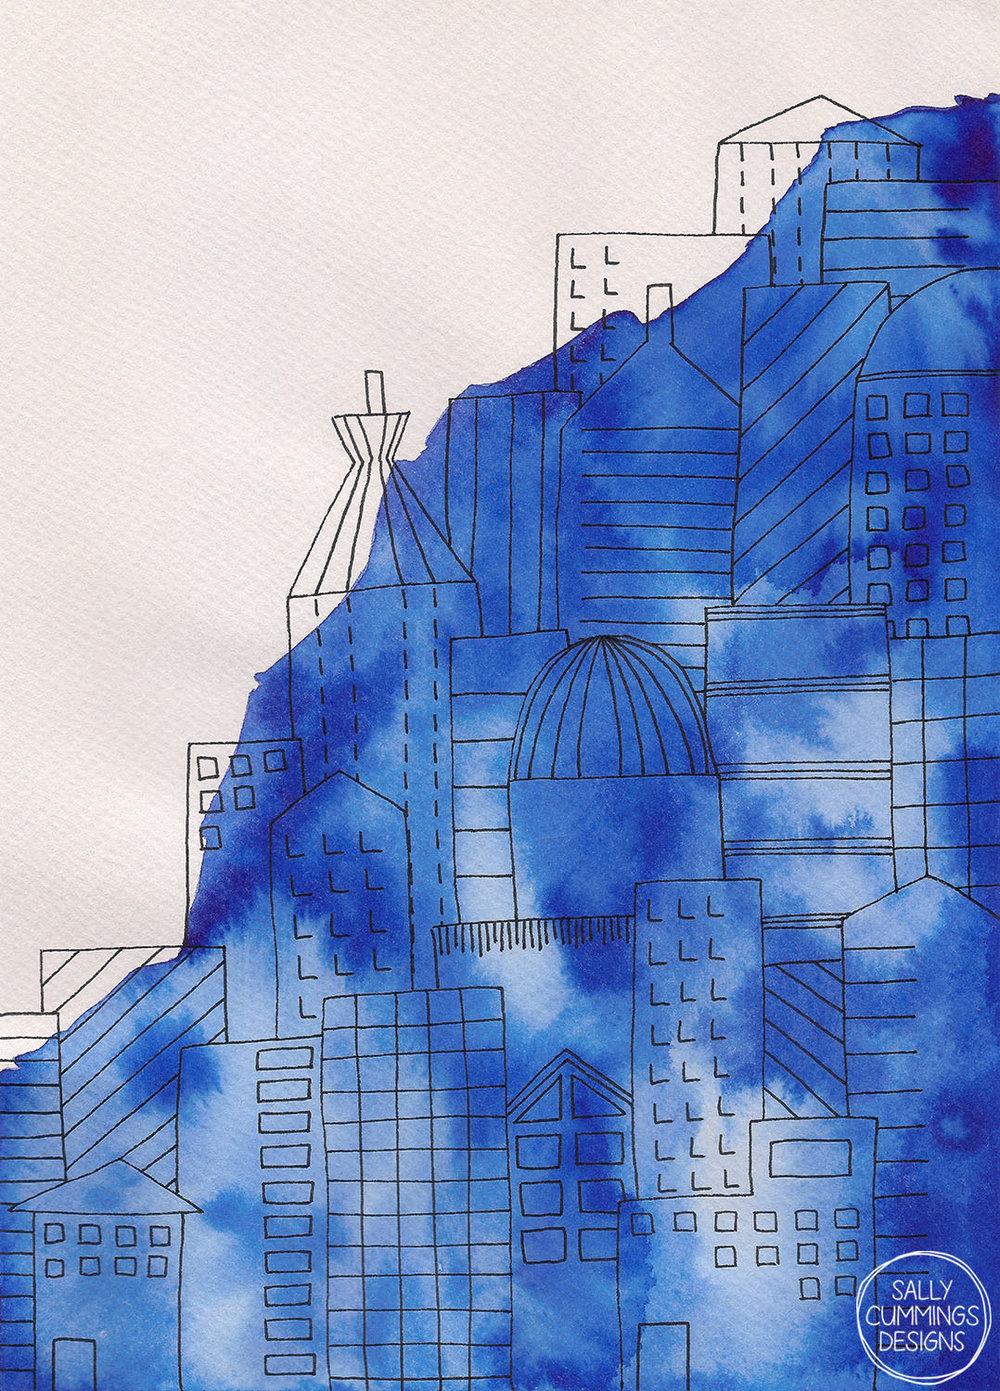 Sally Cummings Designs - Blue Town Triptych (Part 3)